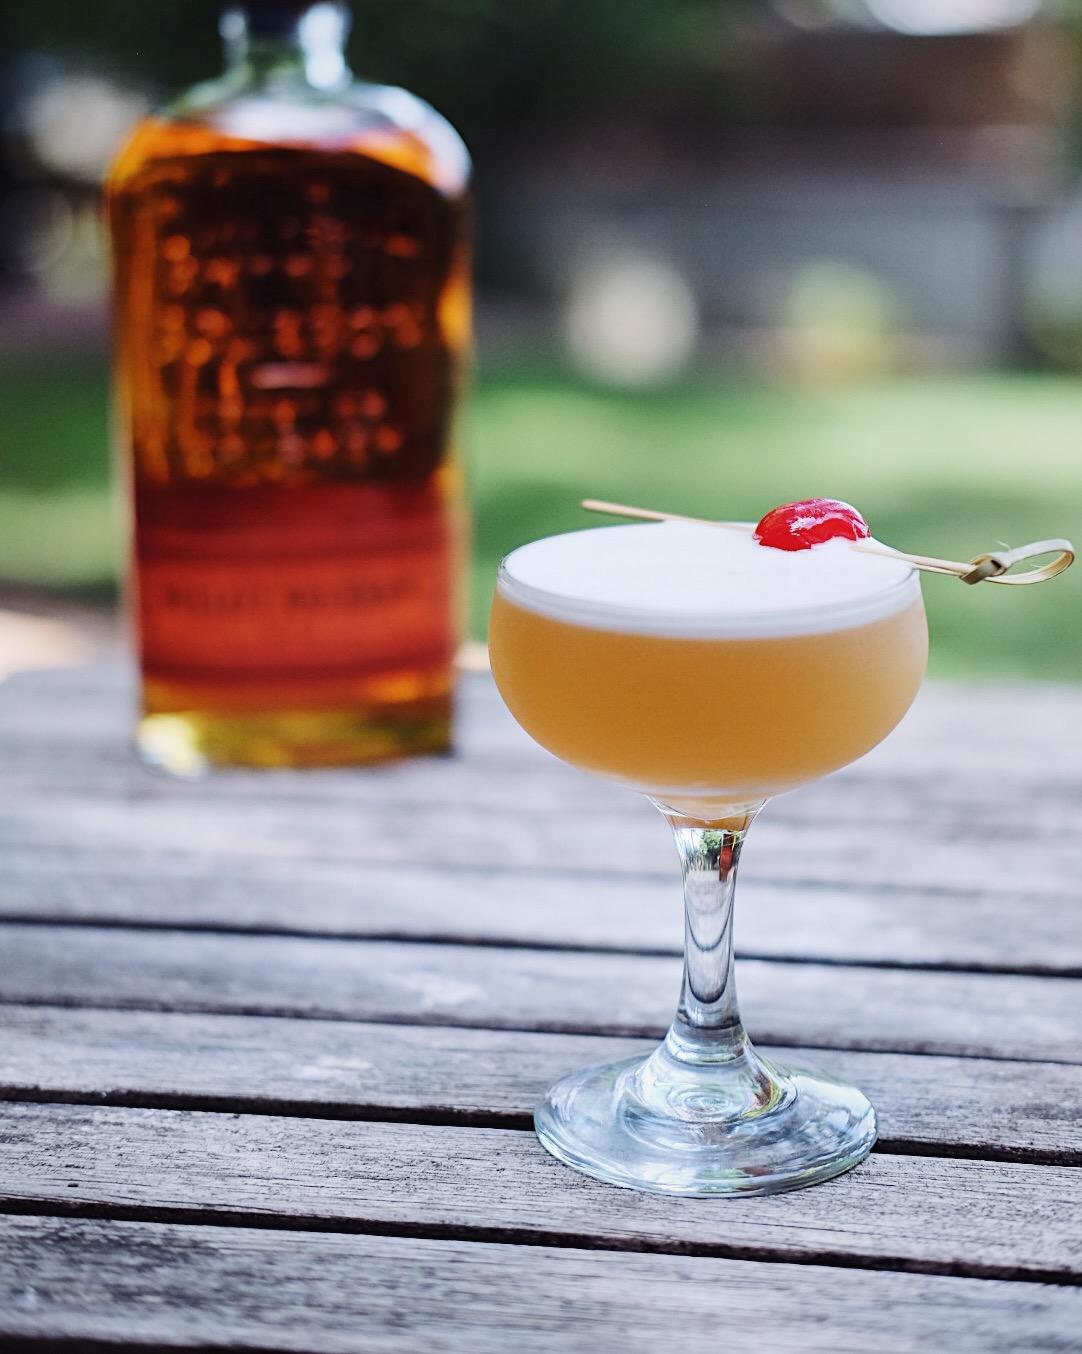 ingredients: - 2 oz bourbon or rye3/4 oz fresh lemon juice3/4 oz simple syrupEgg whiteGarnish: cherry